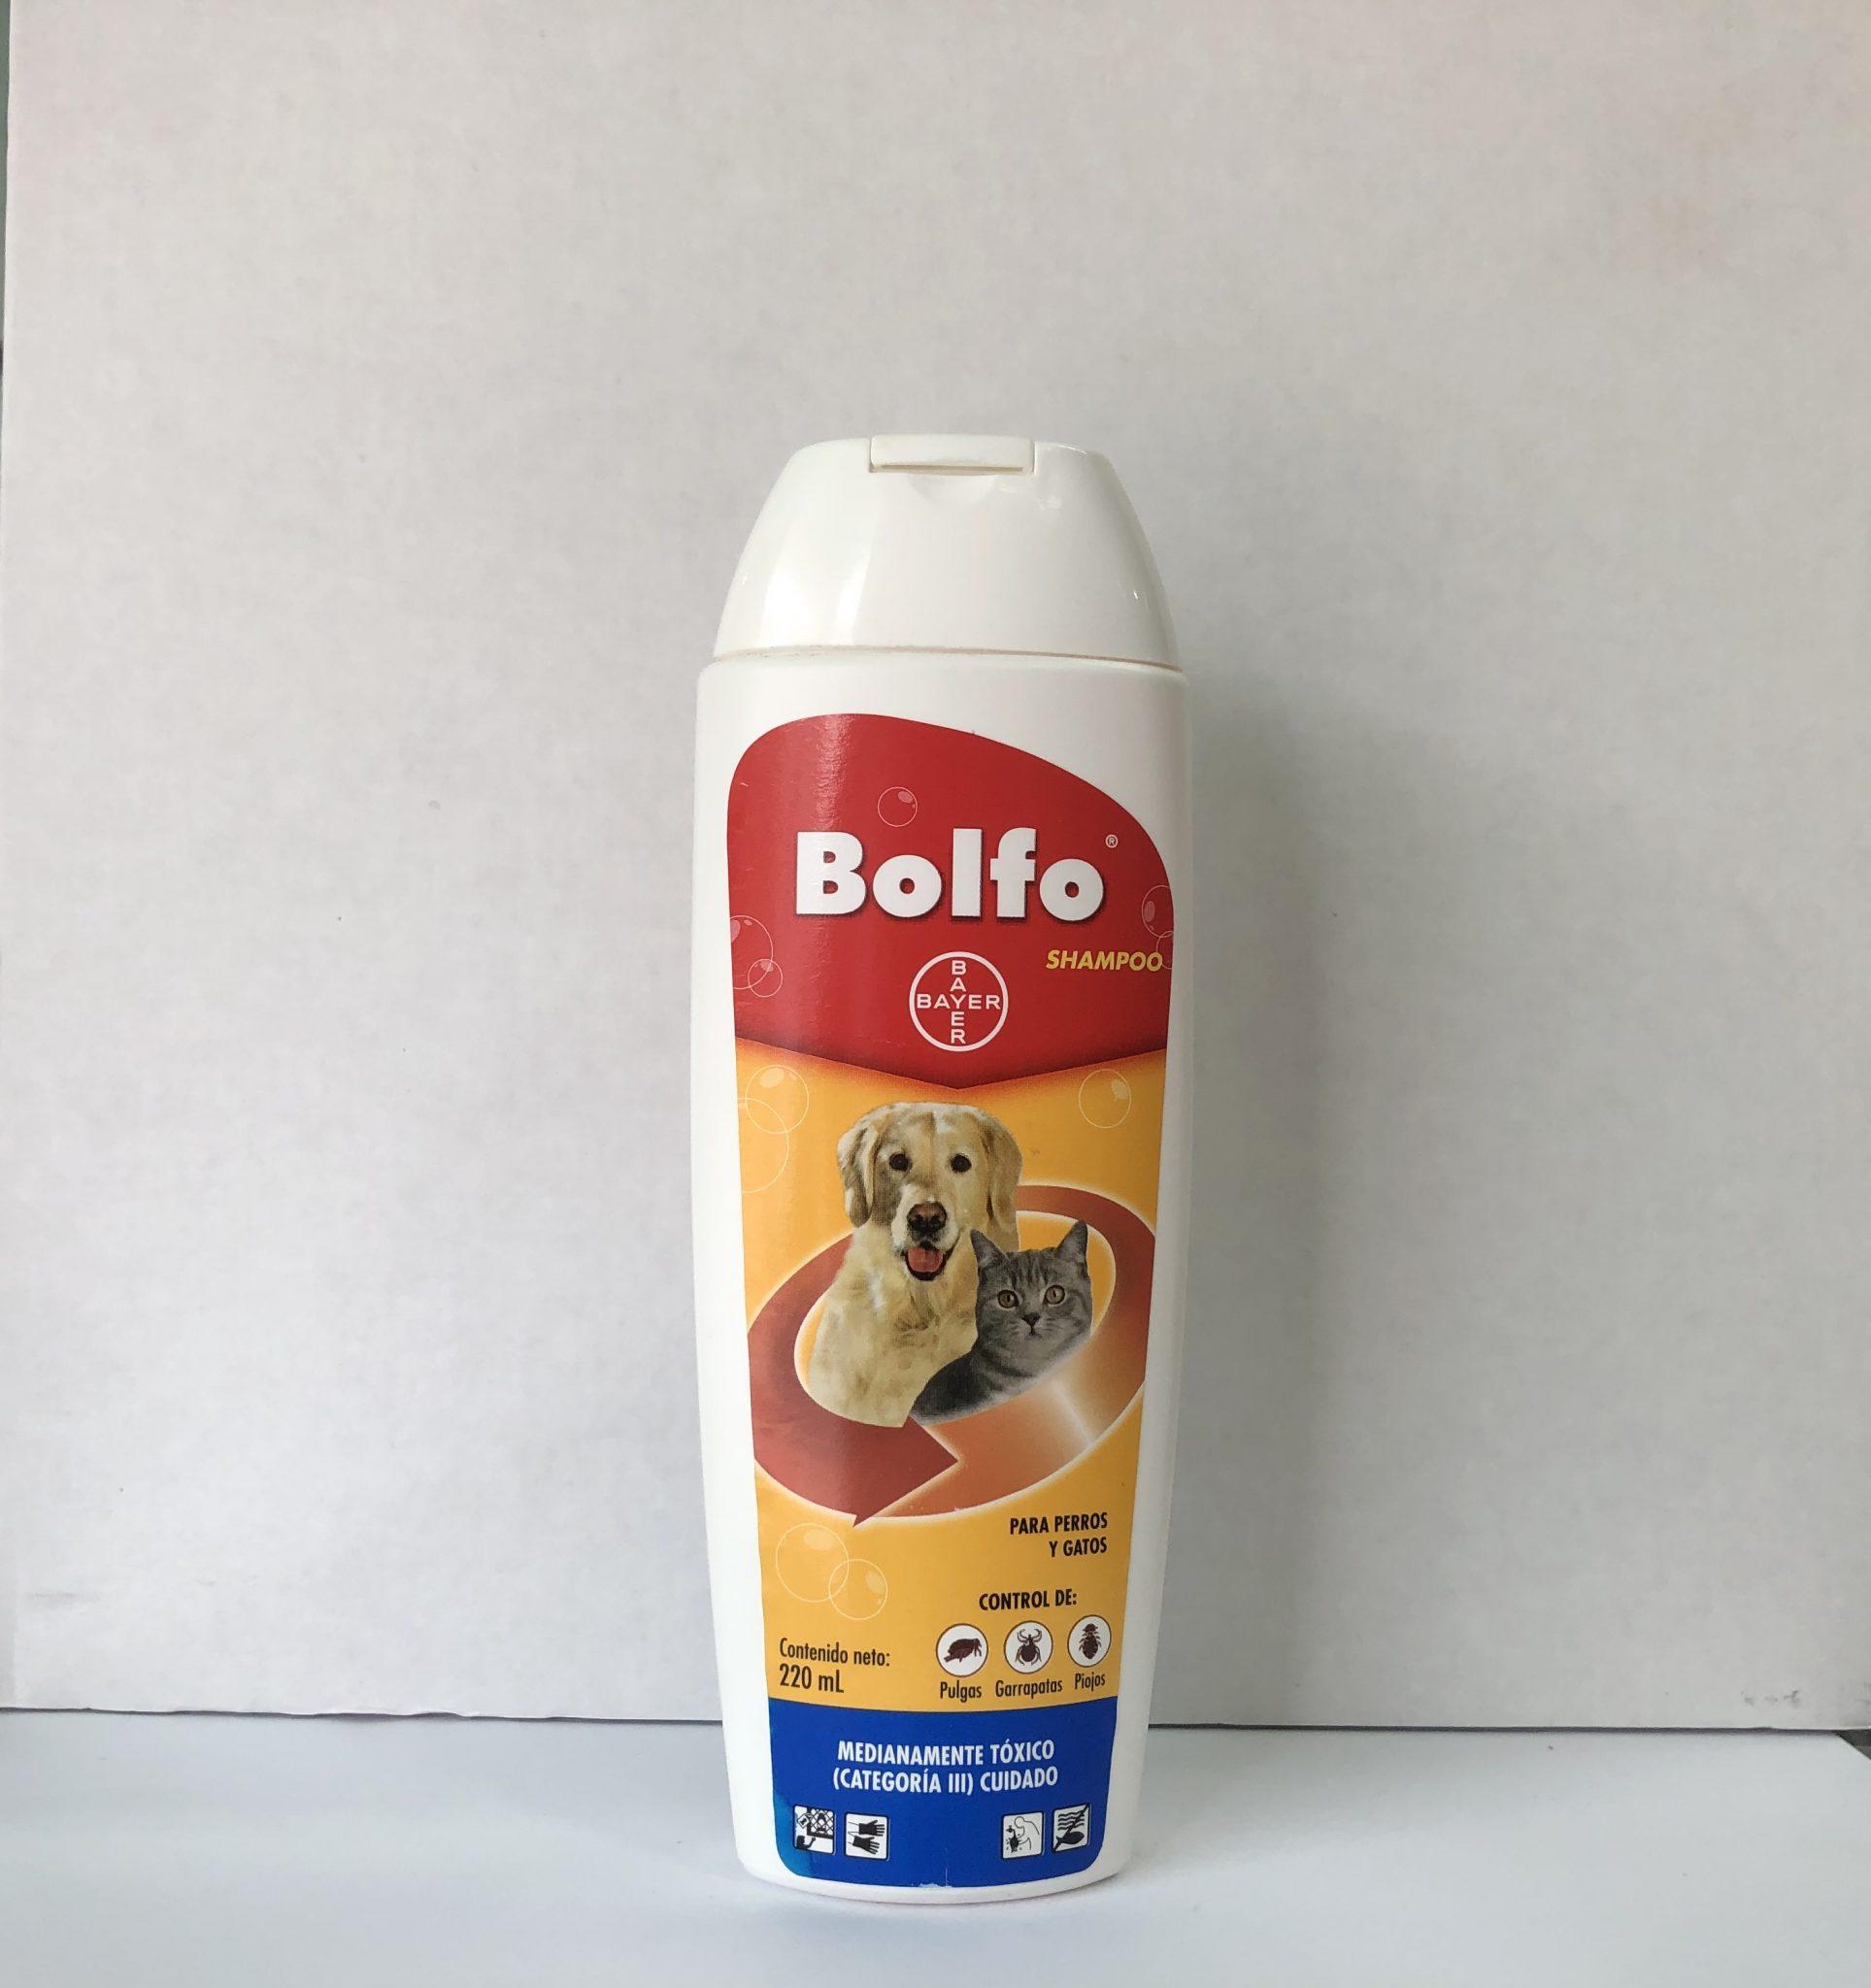 SHAMPOO BOLFO X 220 ML